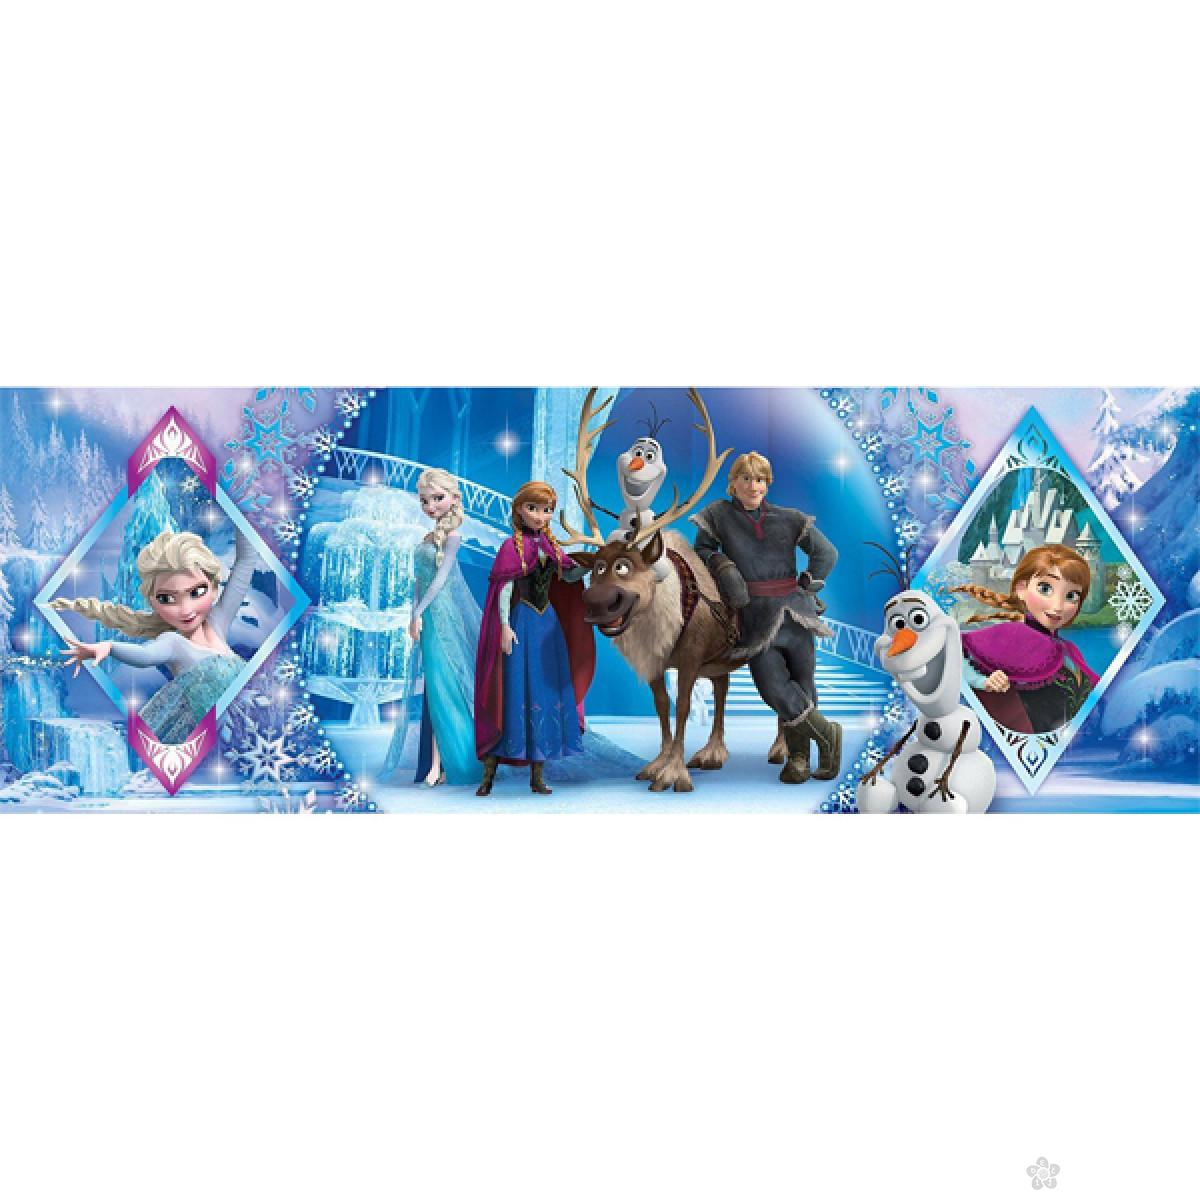 Clementoni puzzla Panorama Frozen 1000pcs, 39447